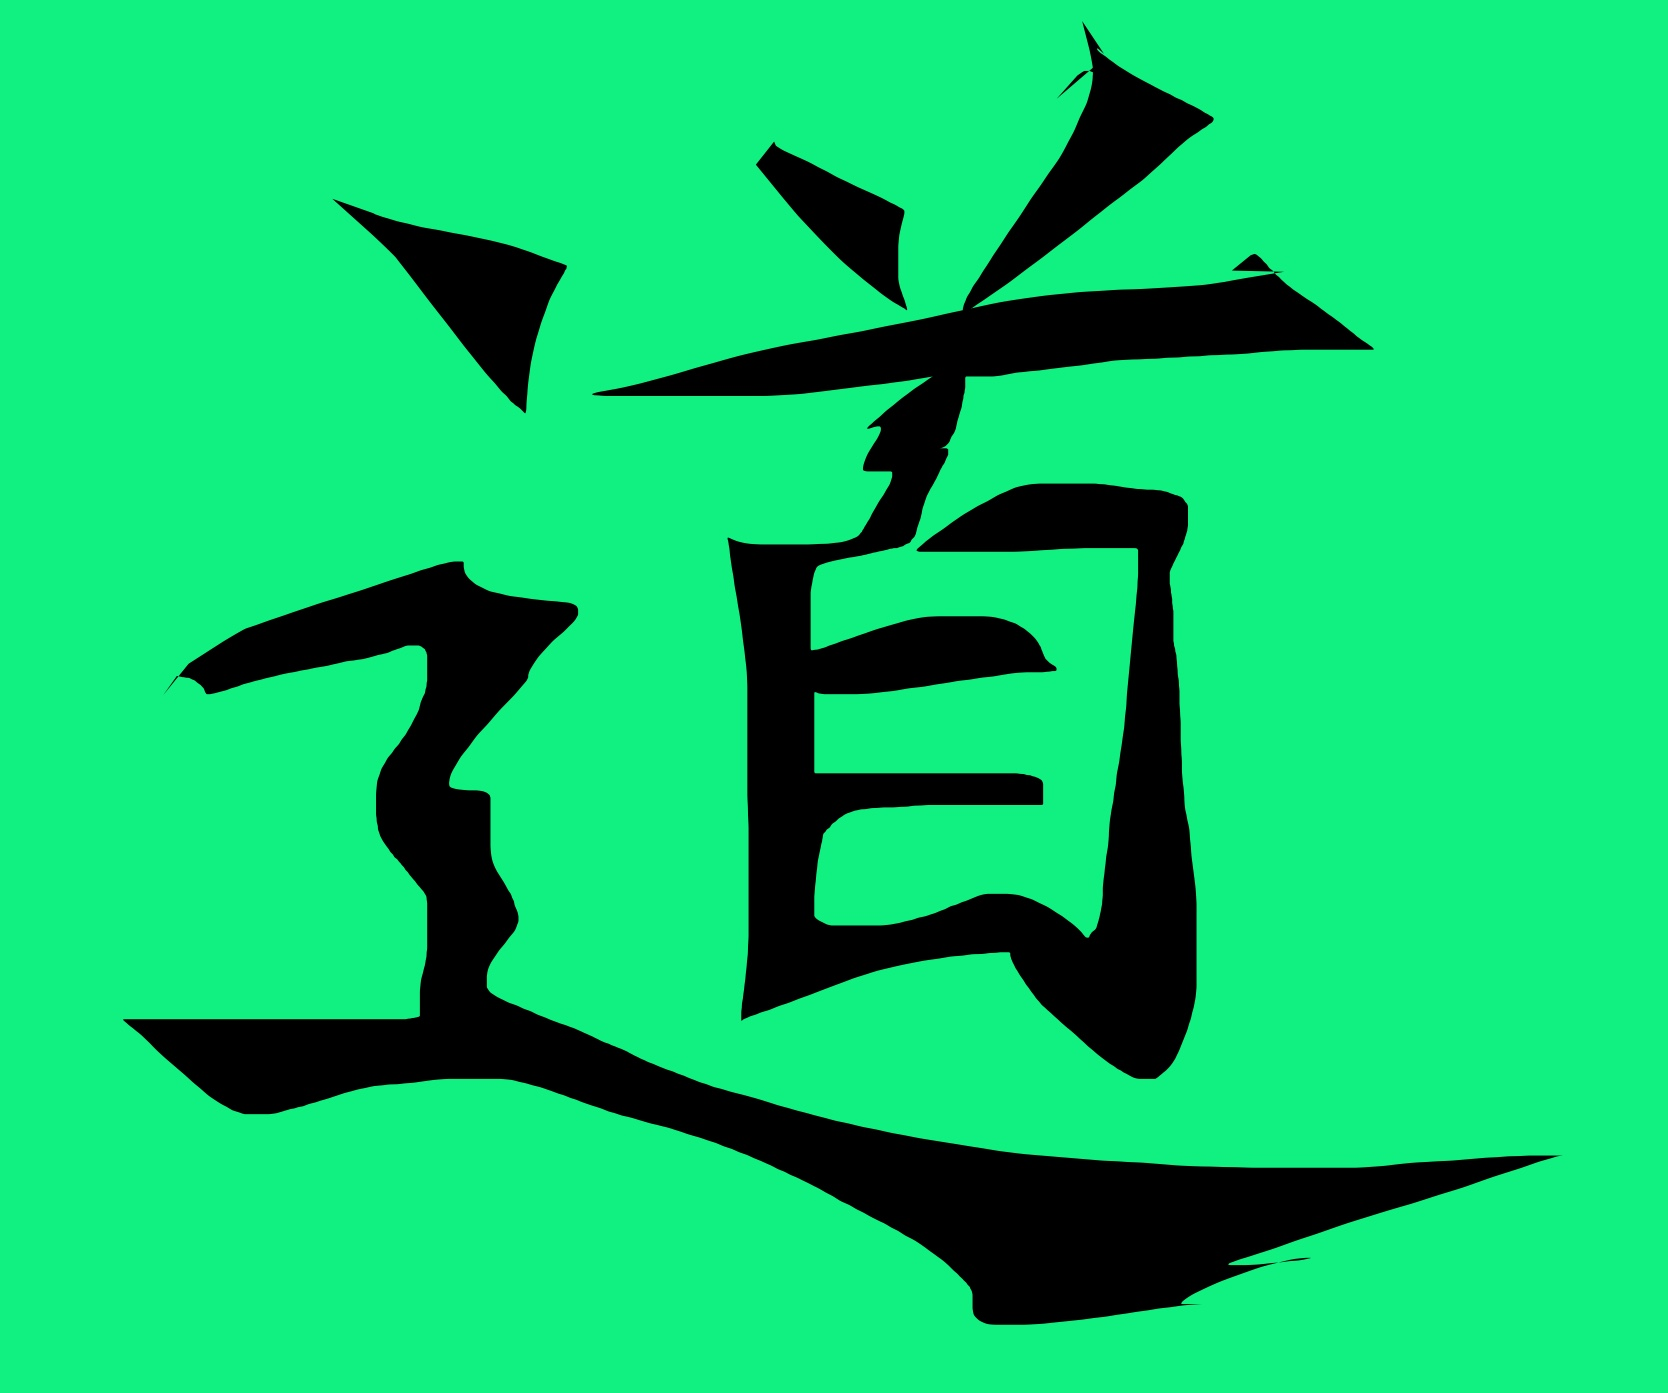 taoism green sketch